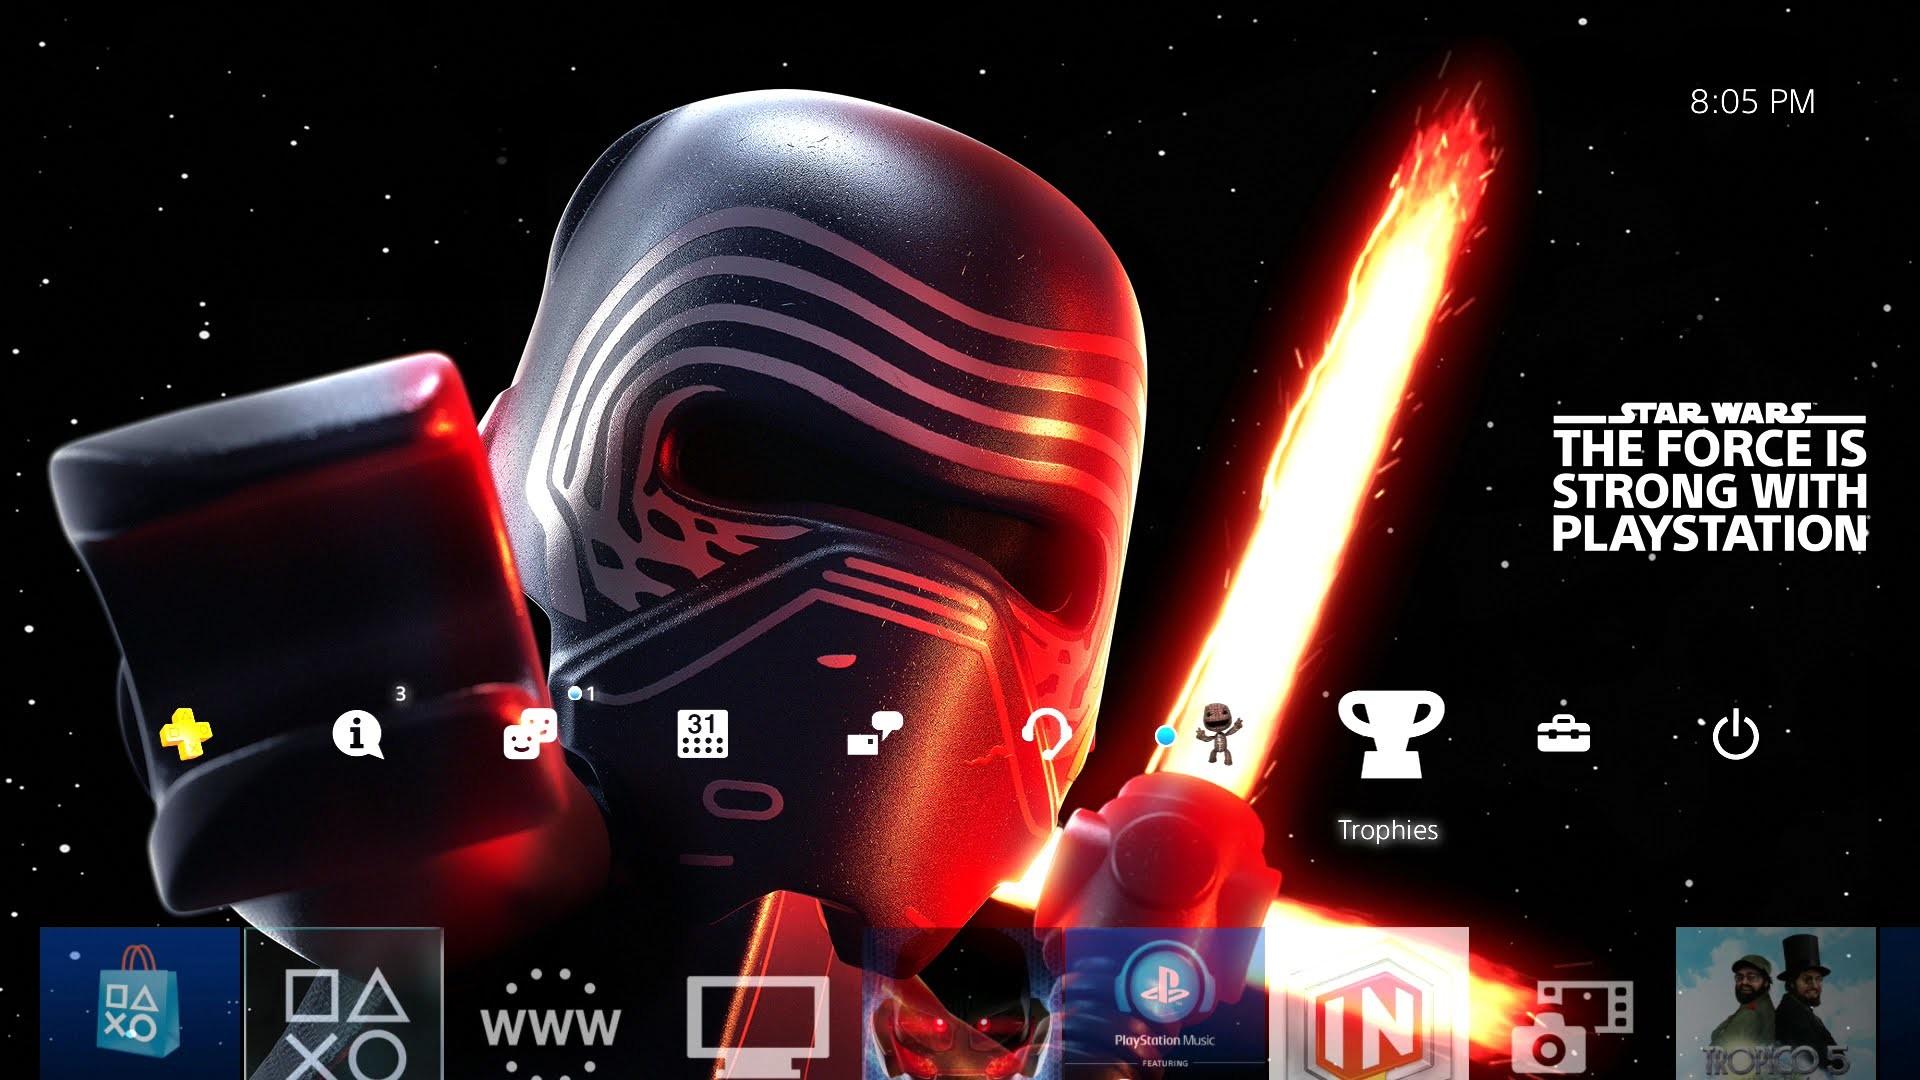 LEGO Star Wars Kylo Ren Playstation Theme